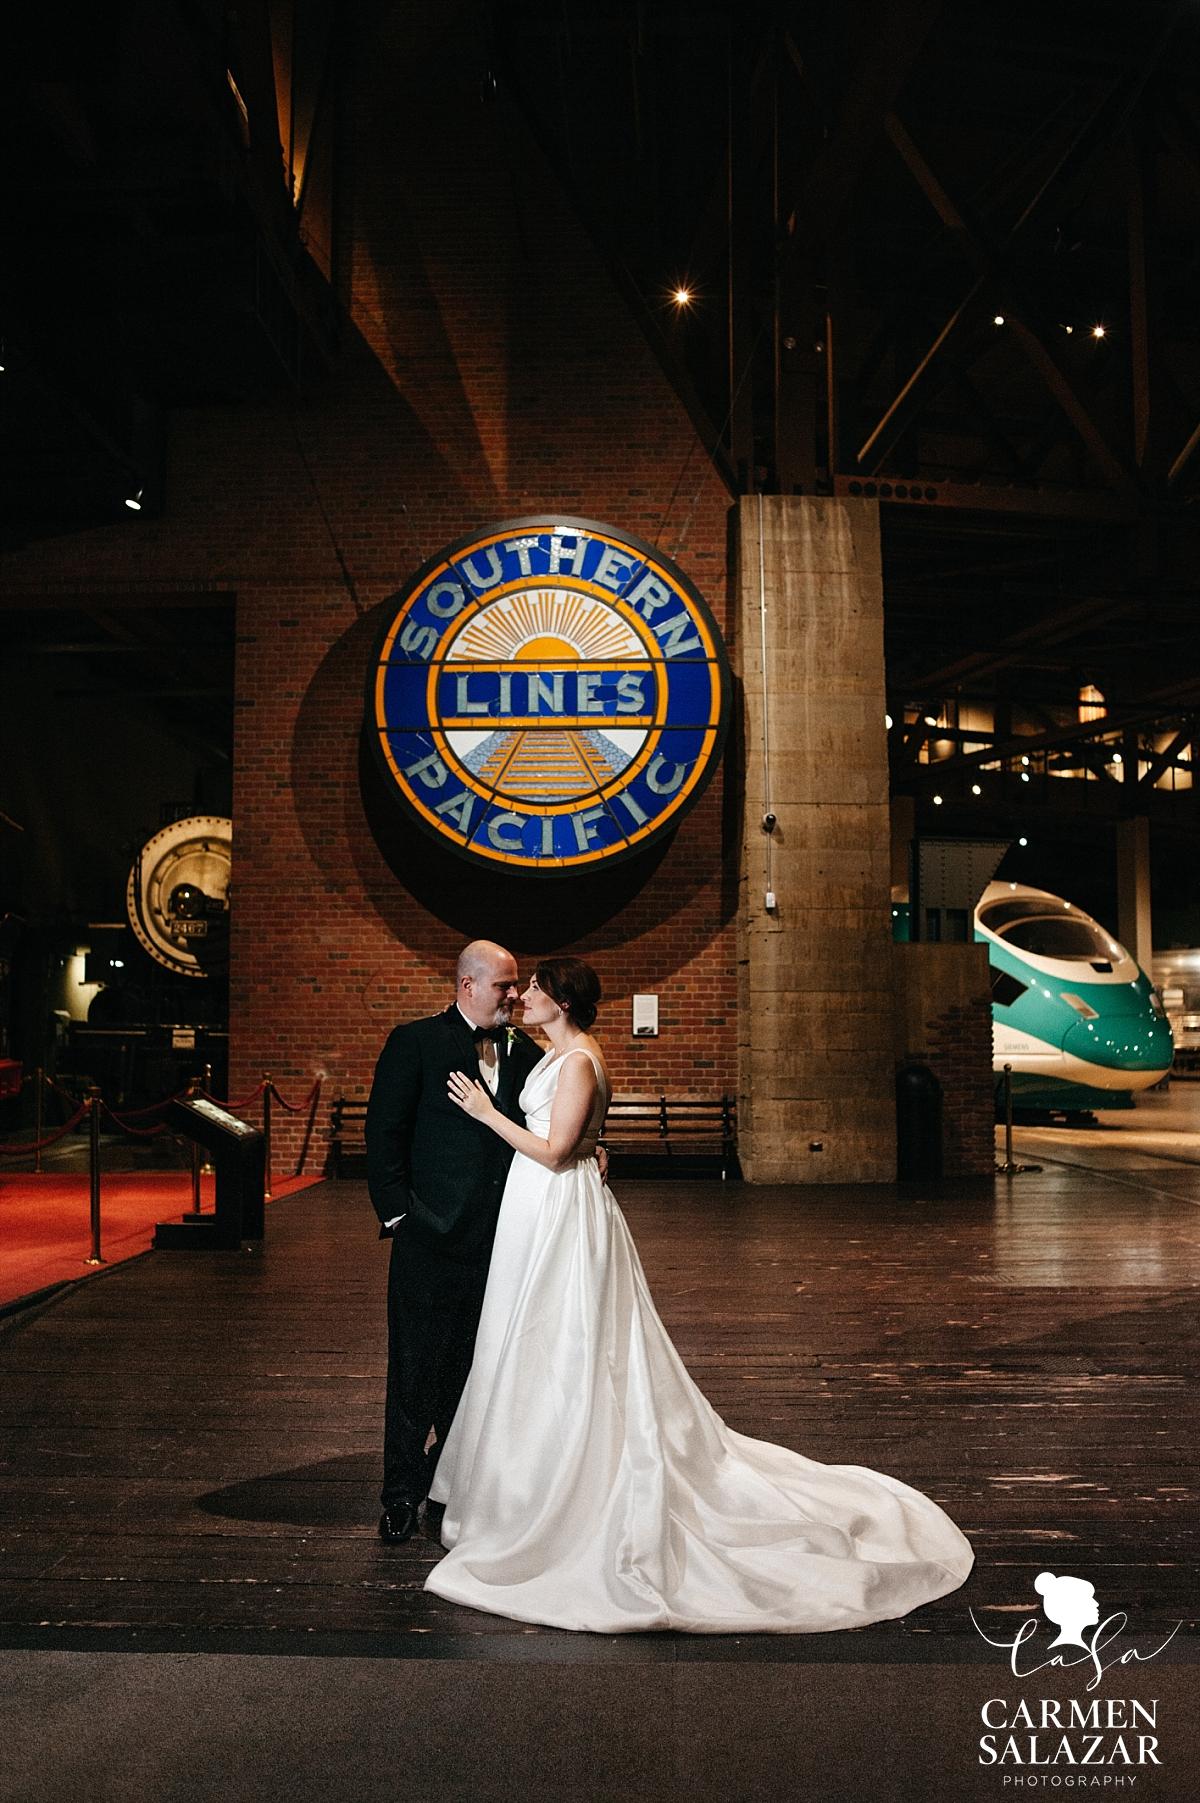 Bride and groom at California Railroad Museum - Carmen Salazar